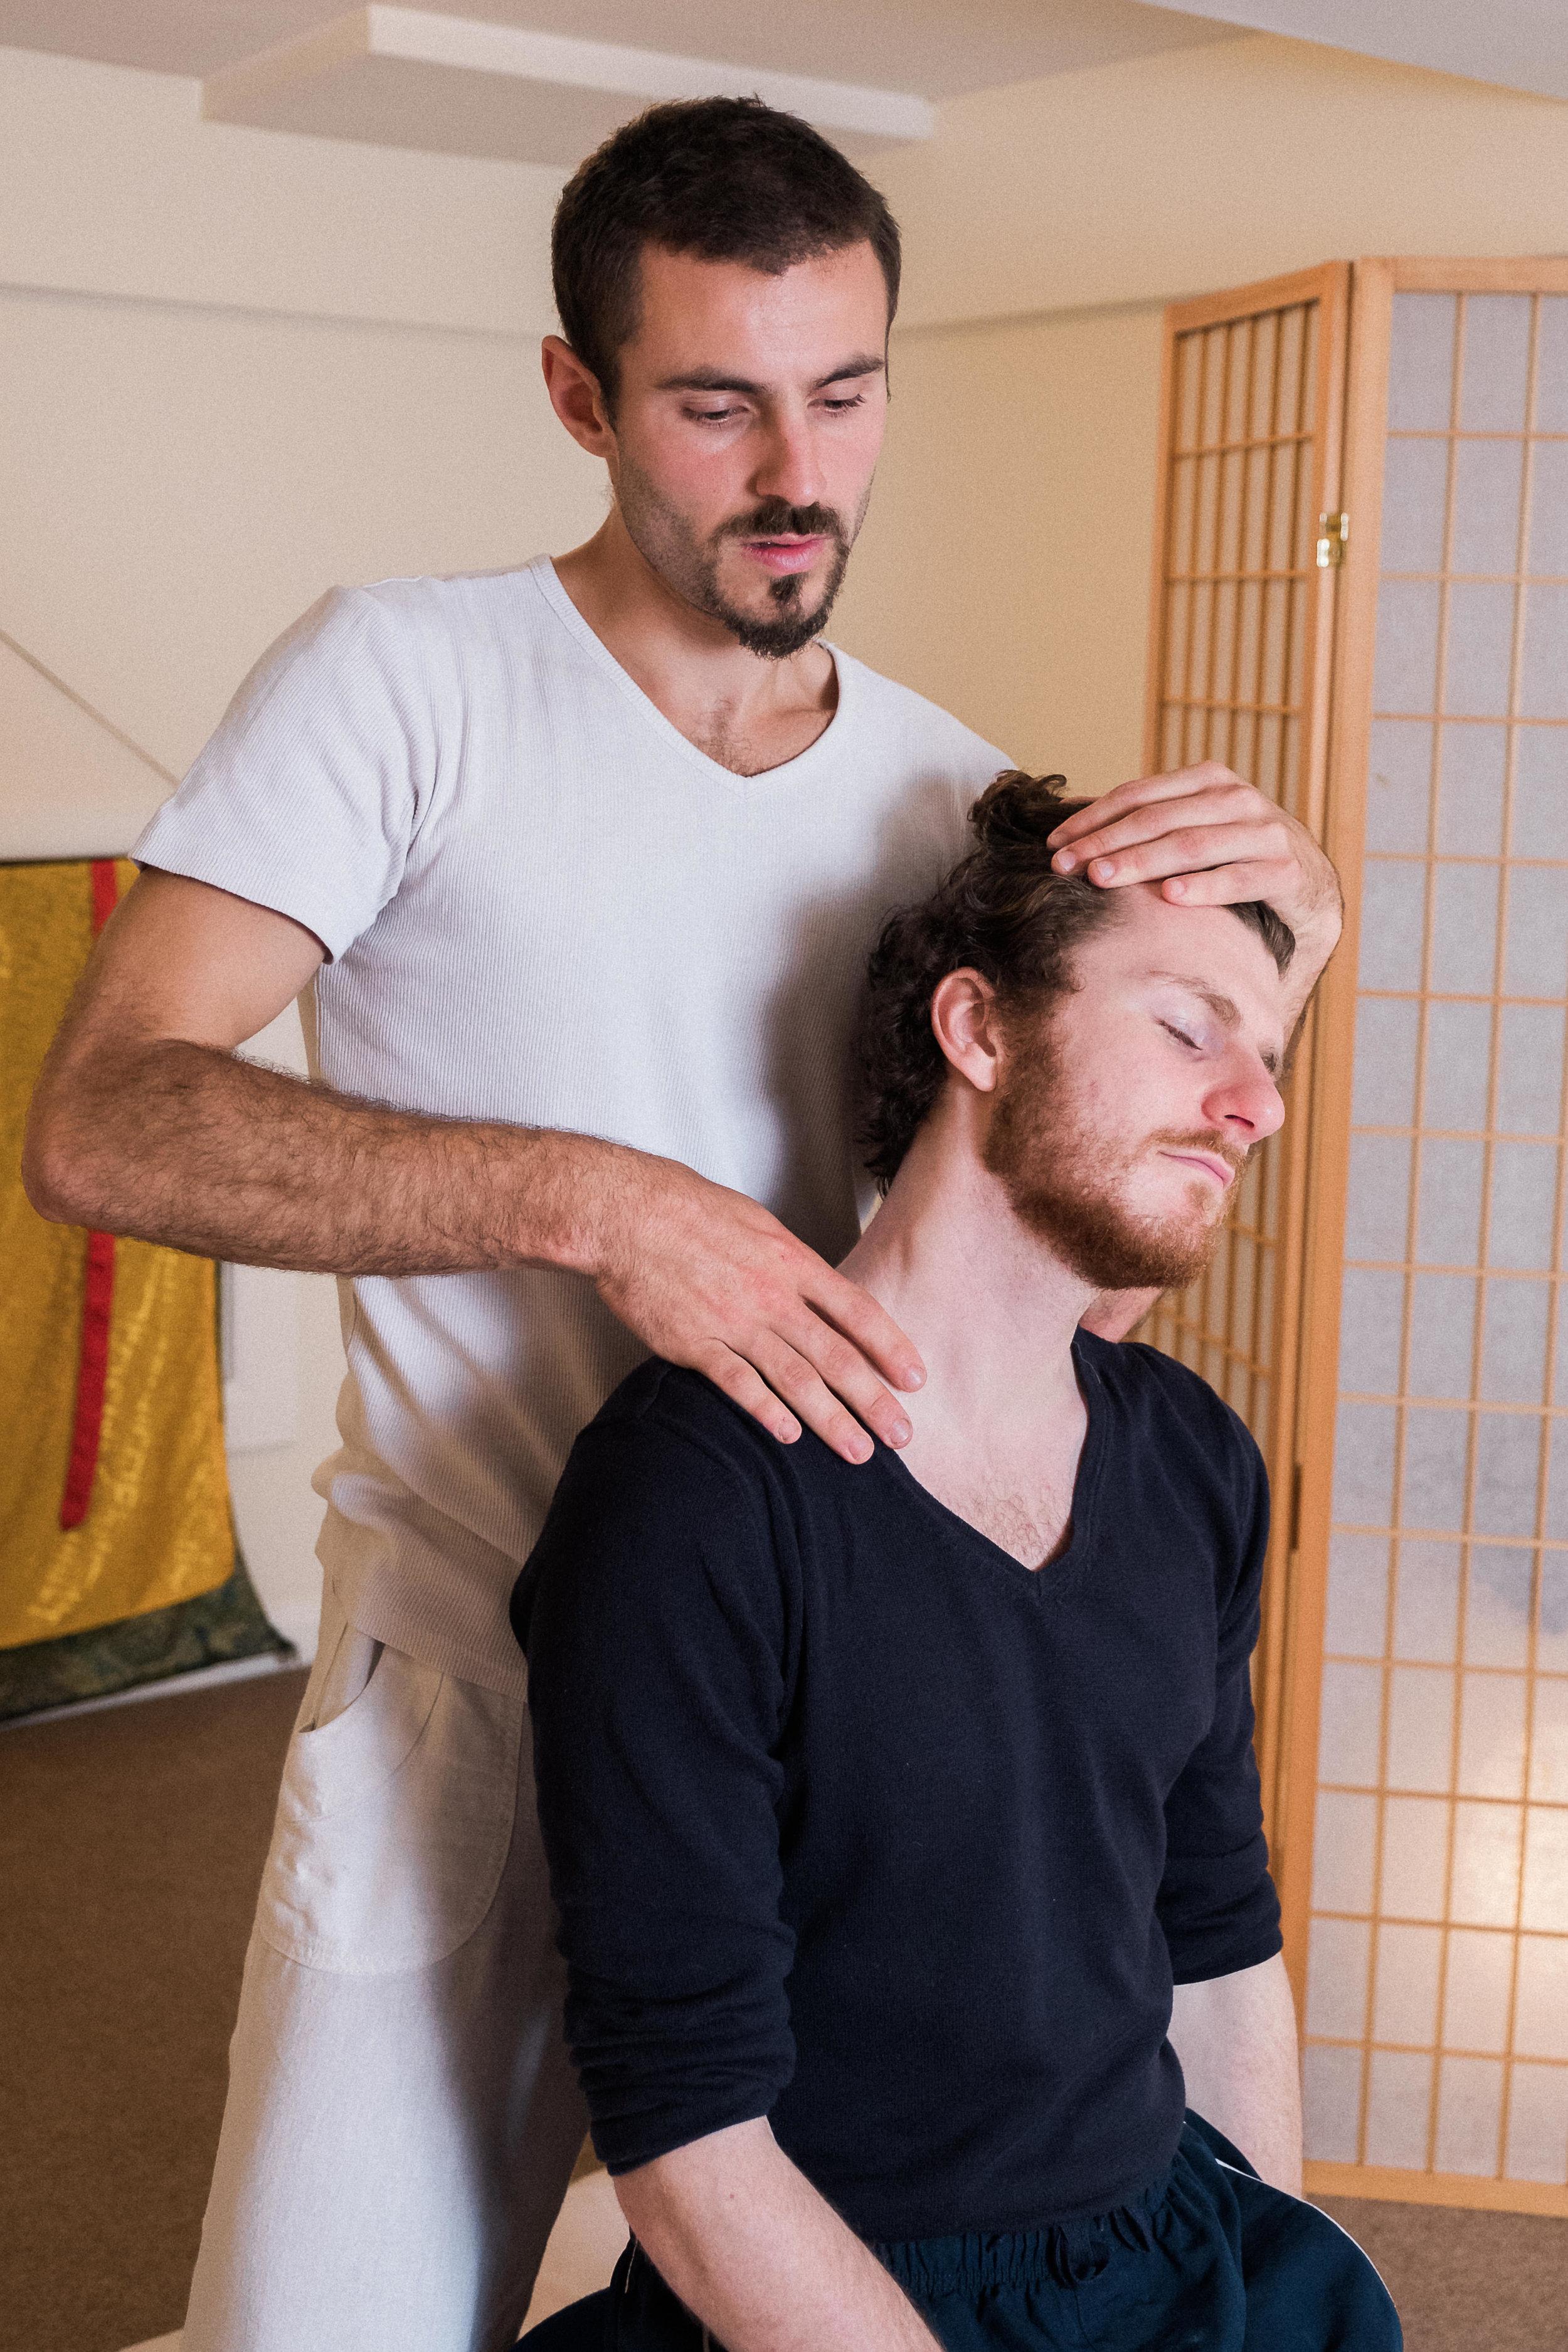 Massage-Edinburgh-Fern-Photography-0078-ZF-2290-64275-1-001-078.jpg